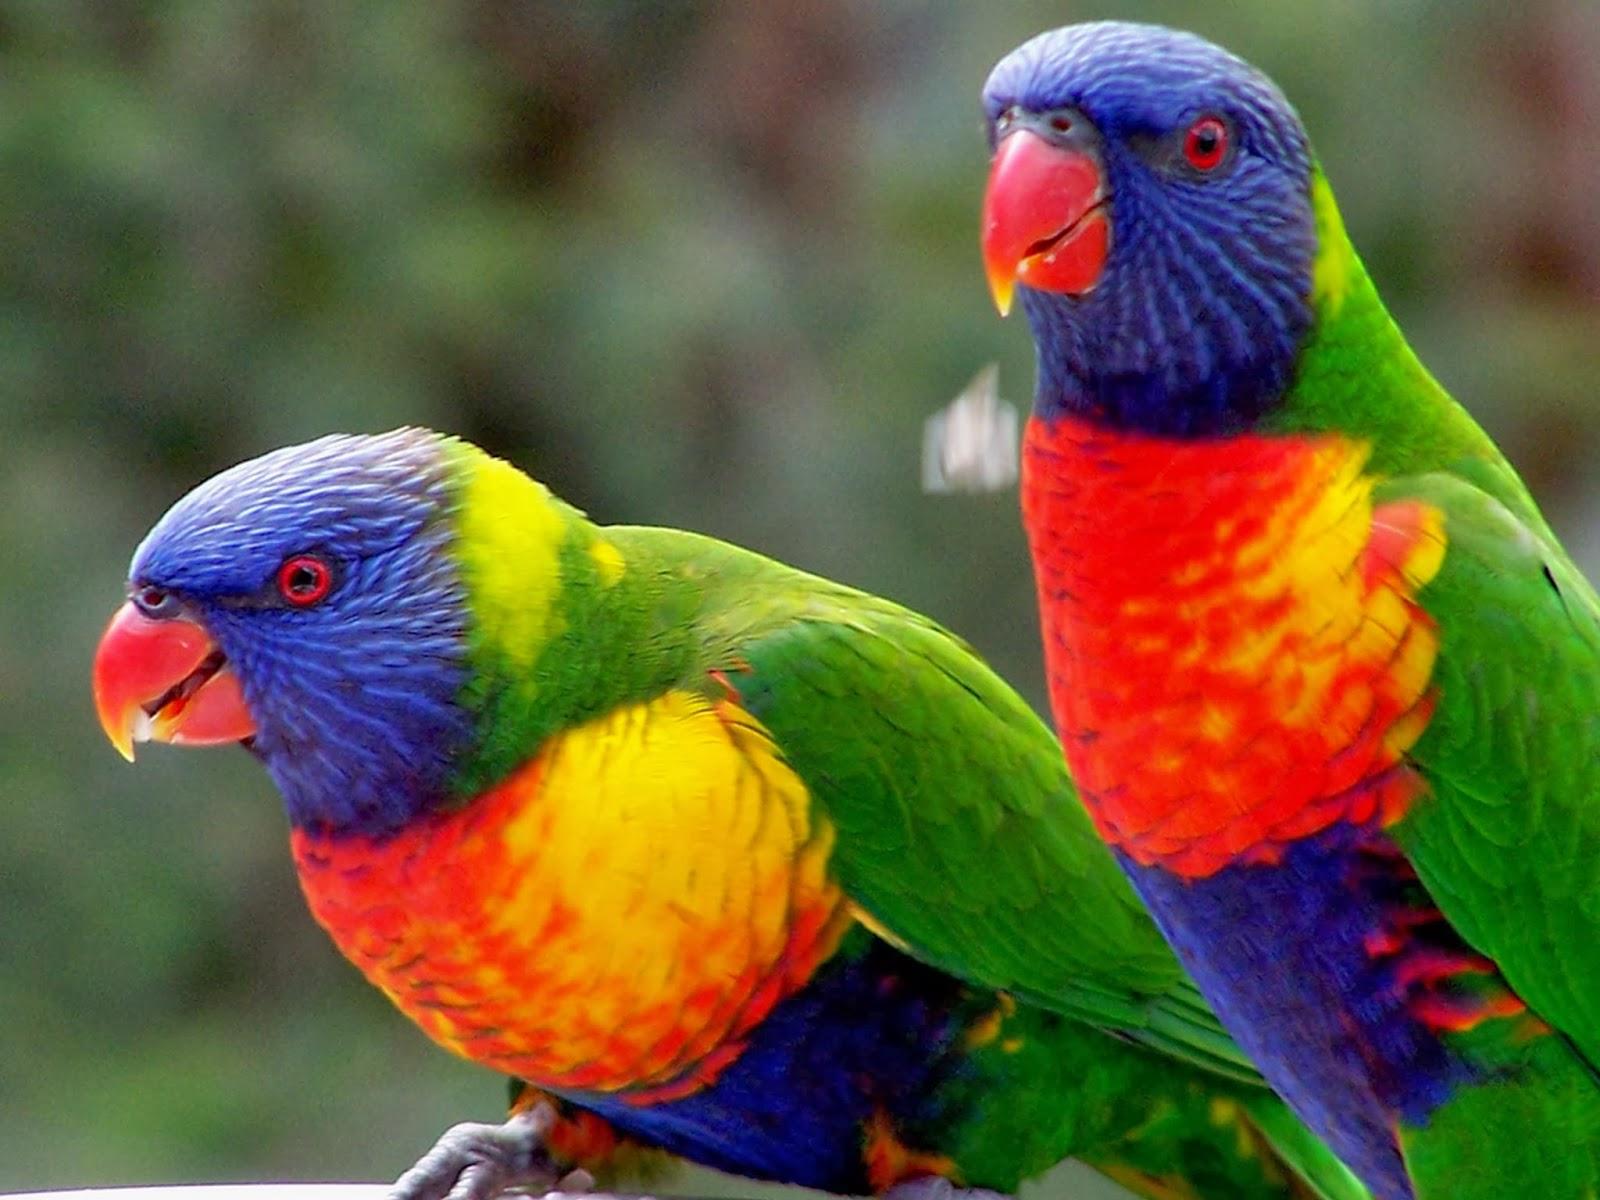 A Beautiful Couple Of Lorikeet Birds Wallpaper Hd: The Rainbow Lorikeet HD Wallpapers And Taxonomy